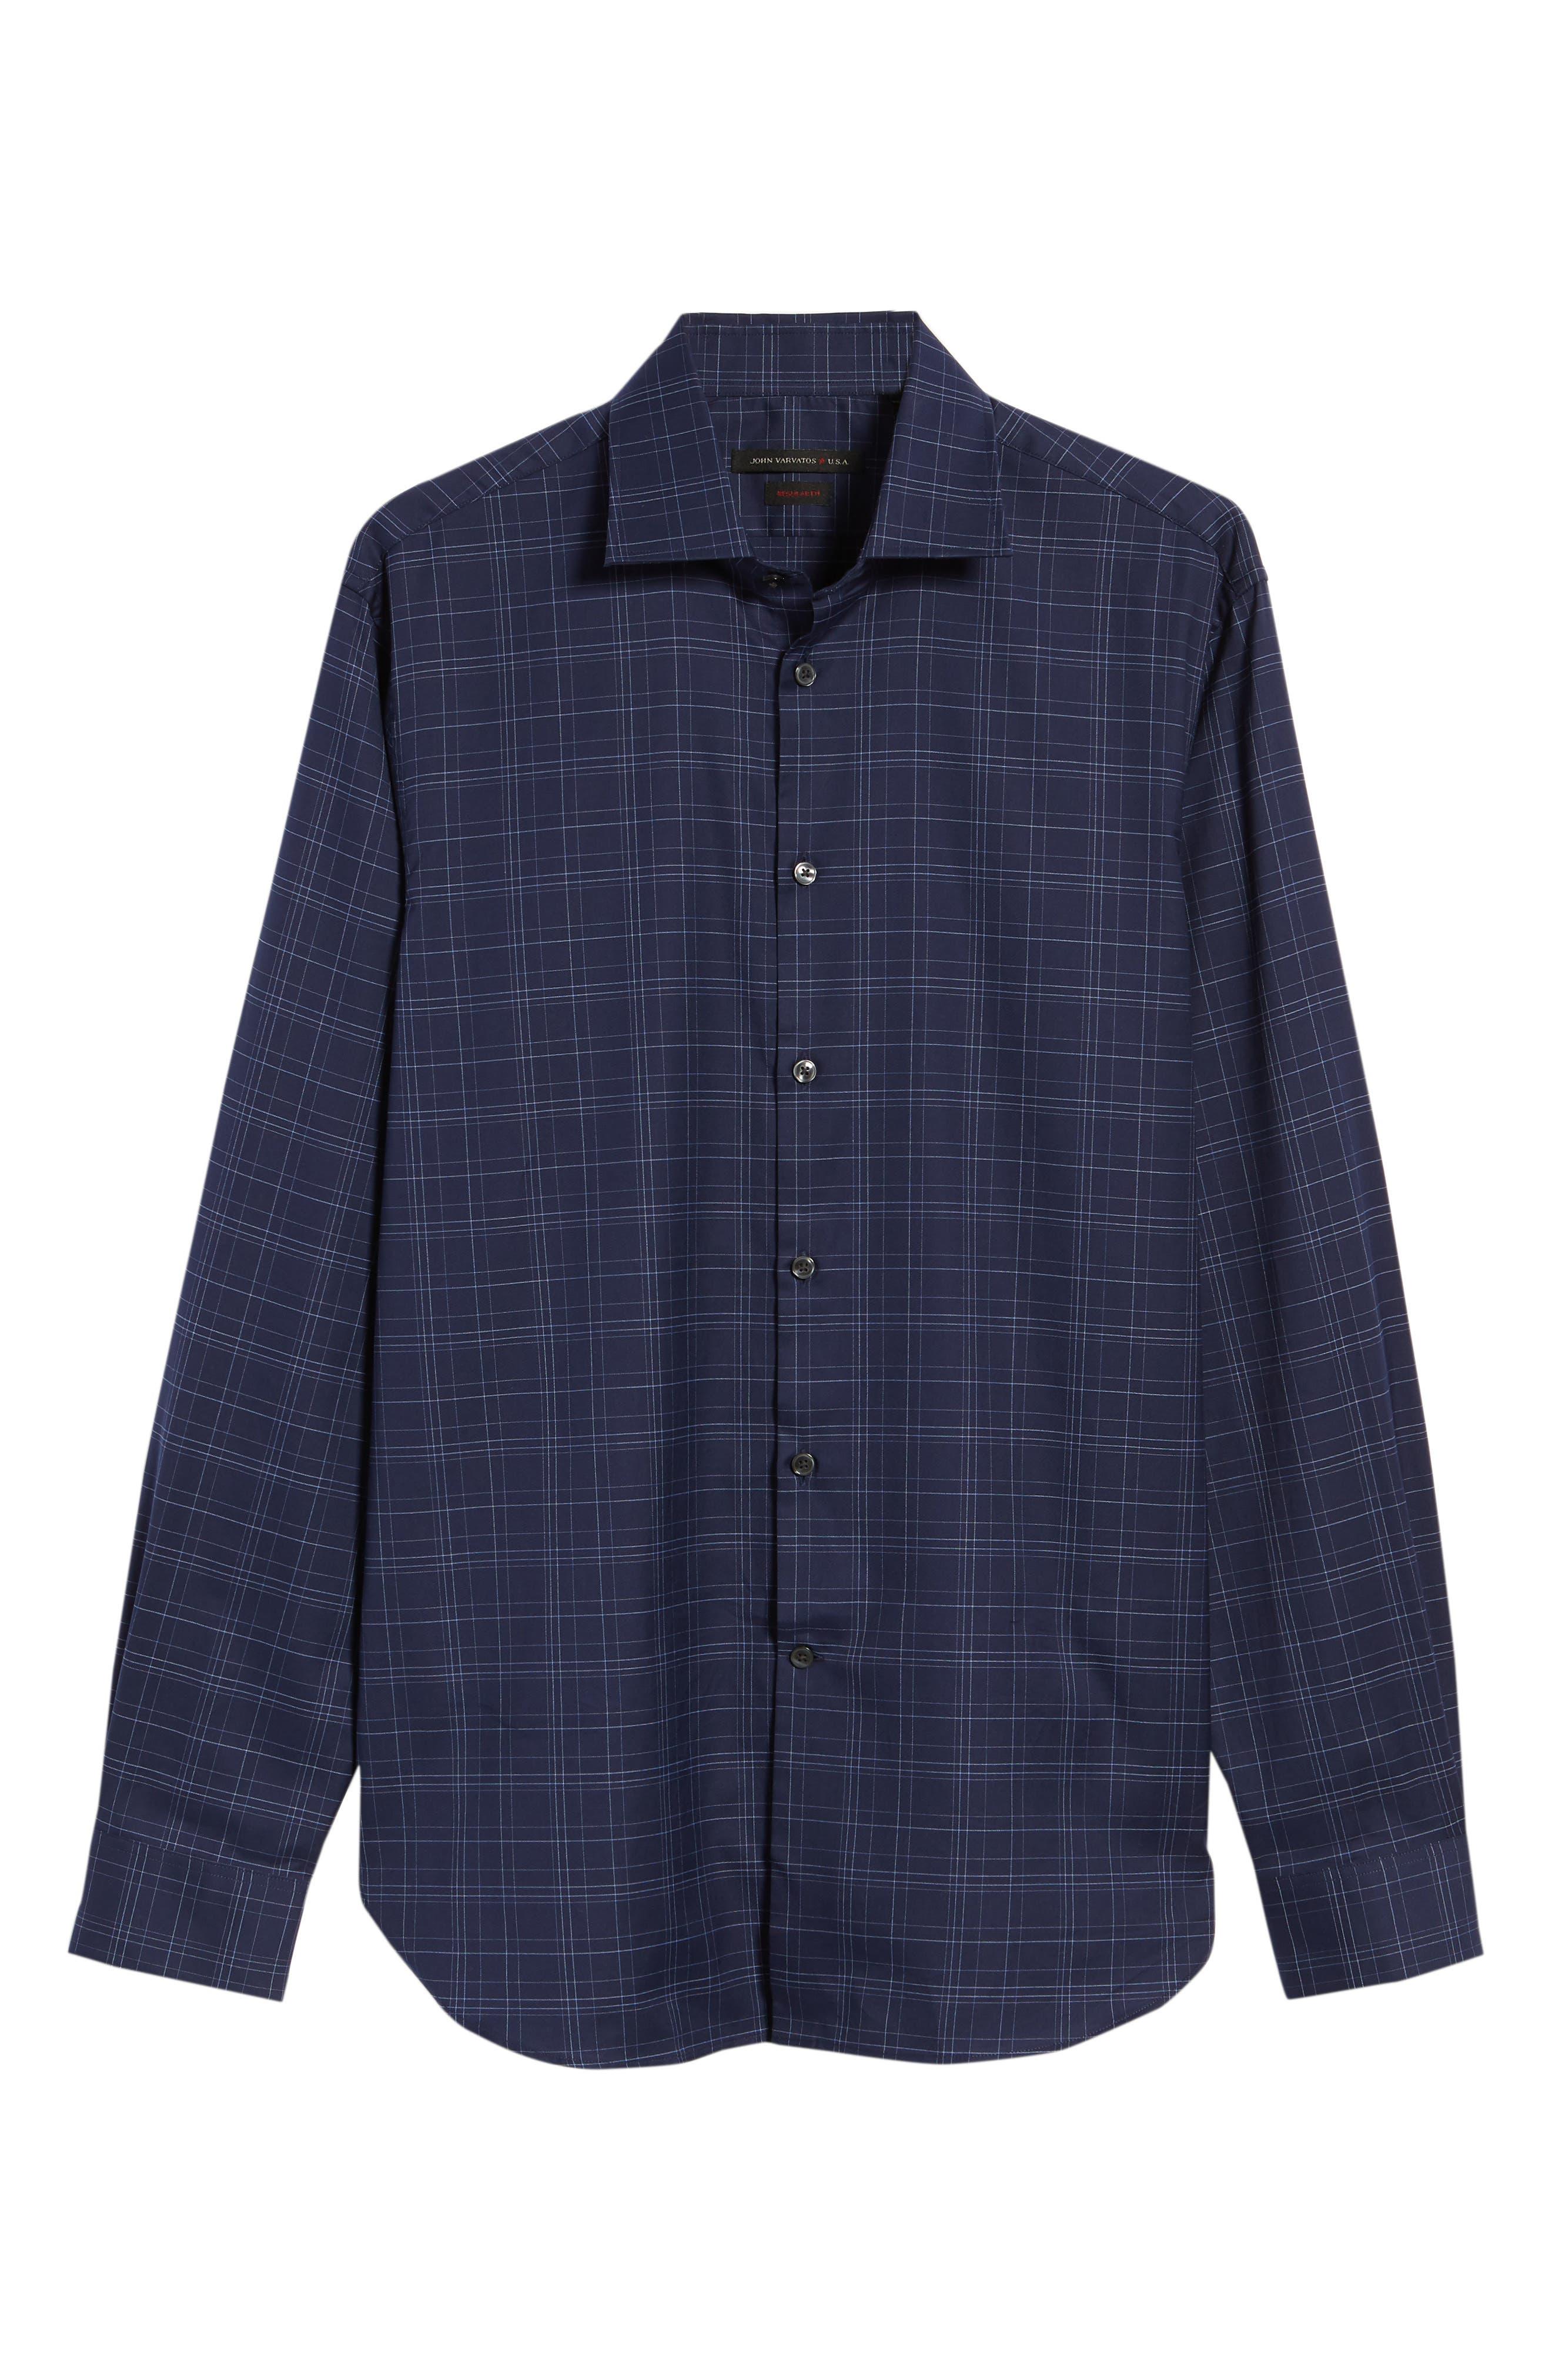 Windowpane Plaid Regular Fit Dress Shirt,                             Alternate thumbnail 5, color,                             INDIGO